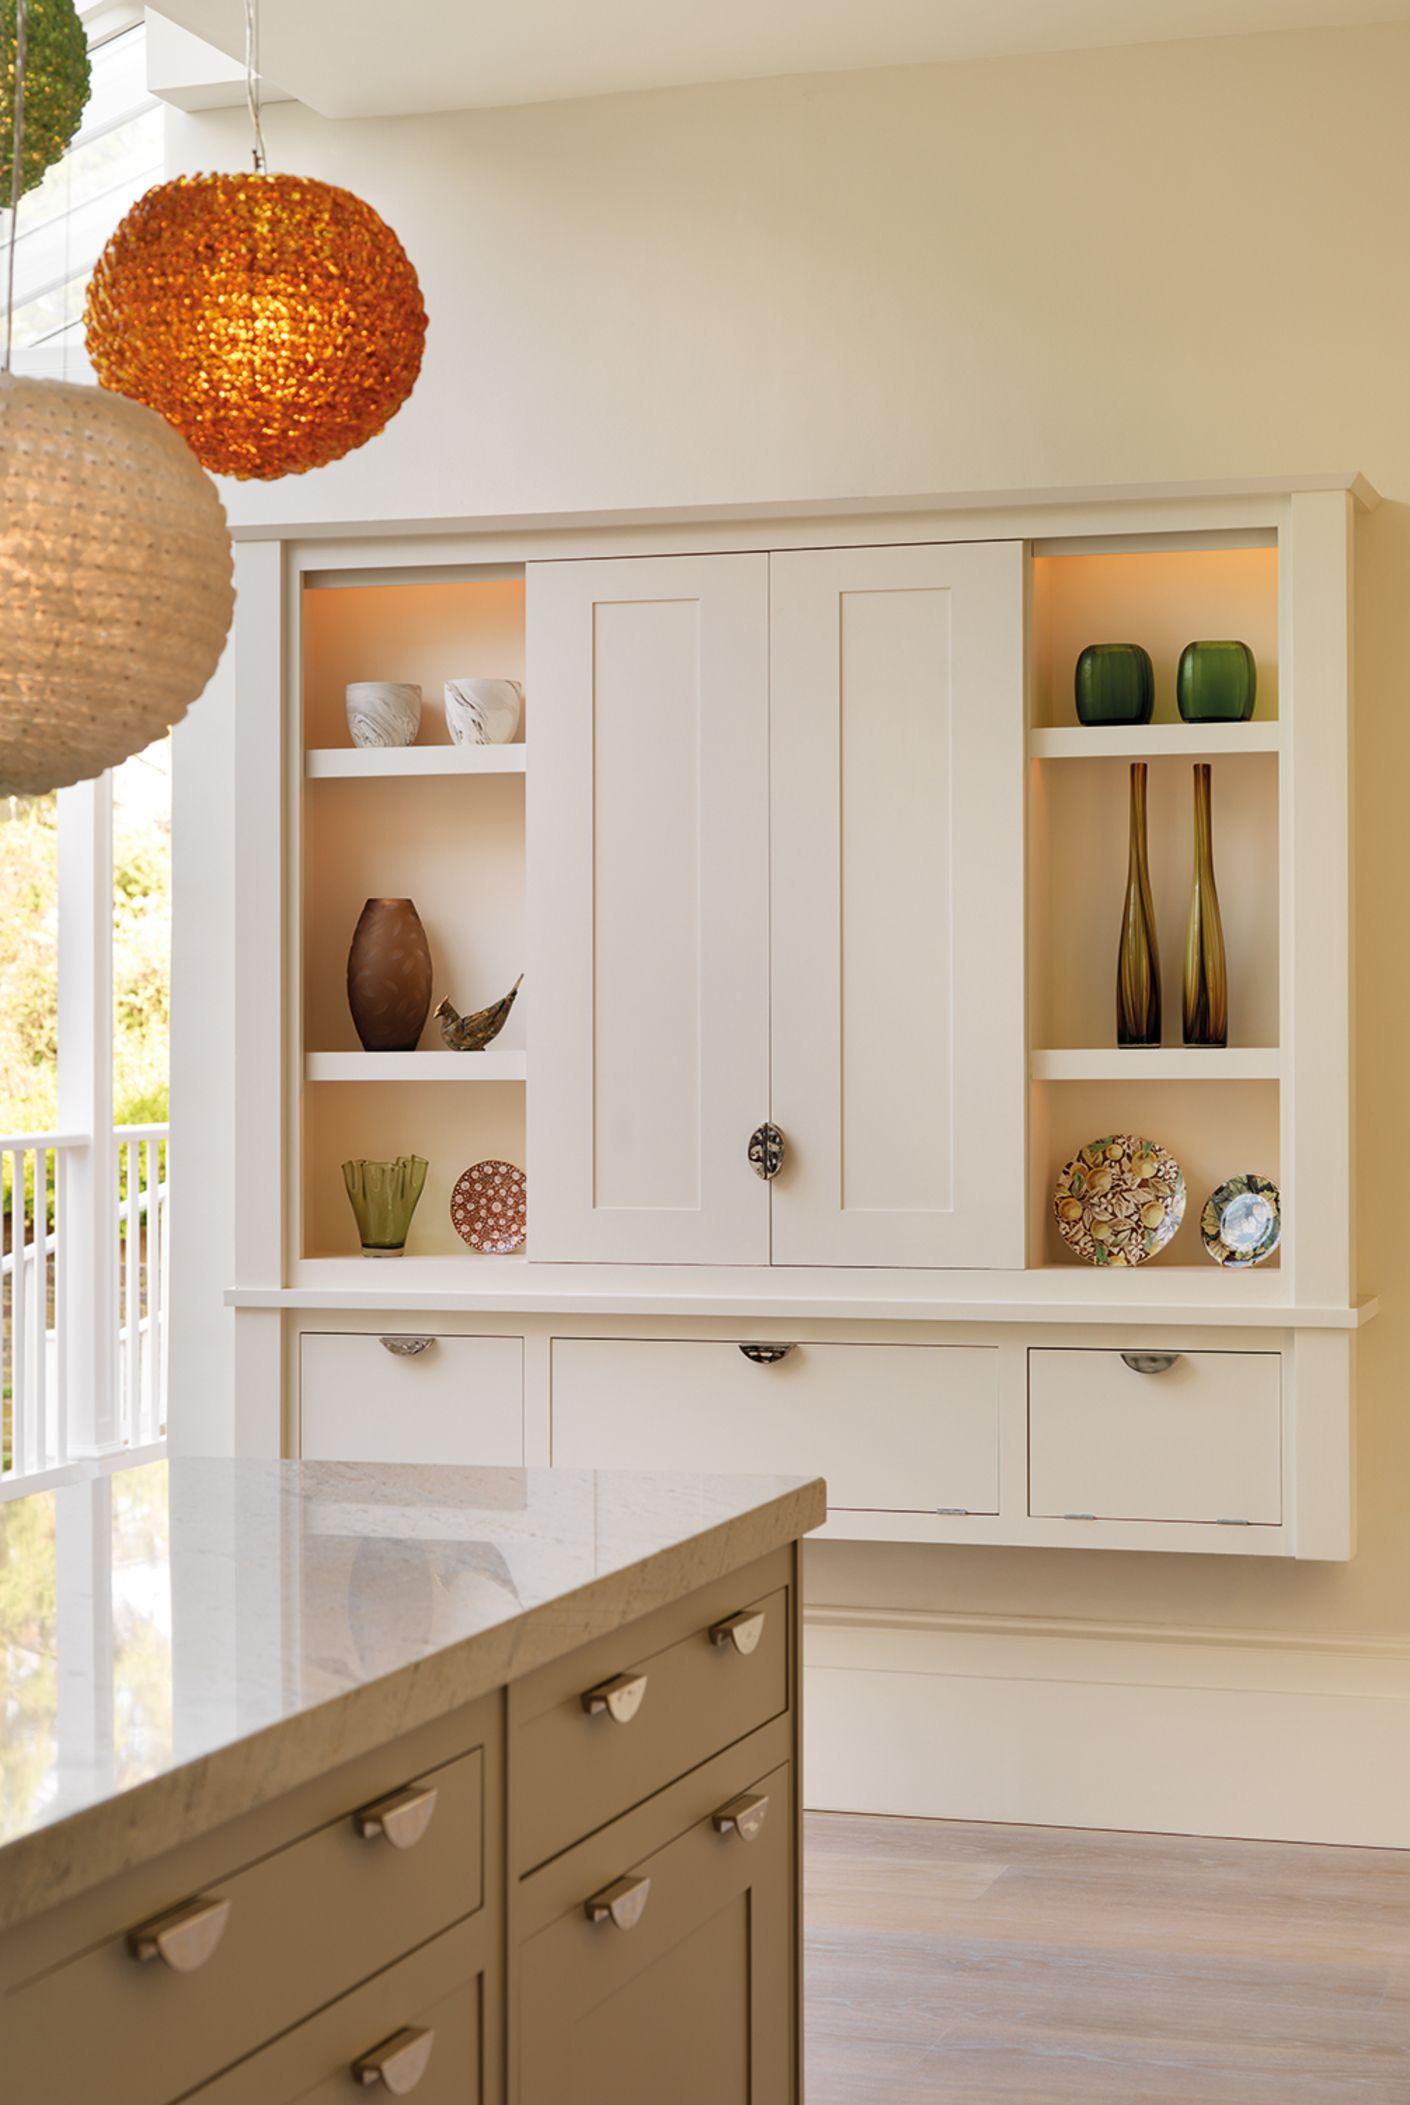 7 smallbone of devizes greenbury hand painted kitchen ...